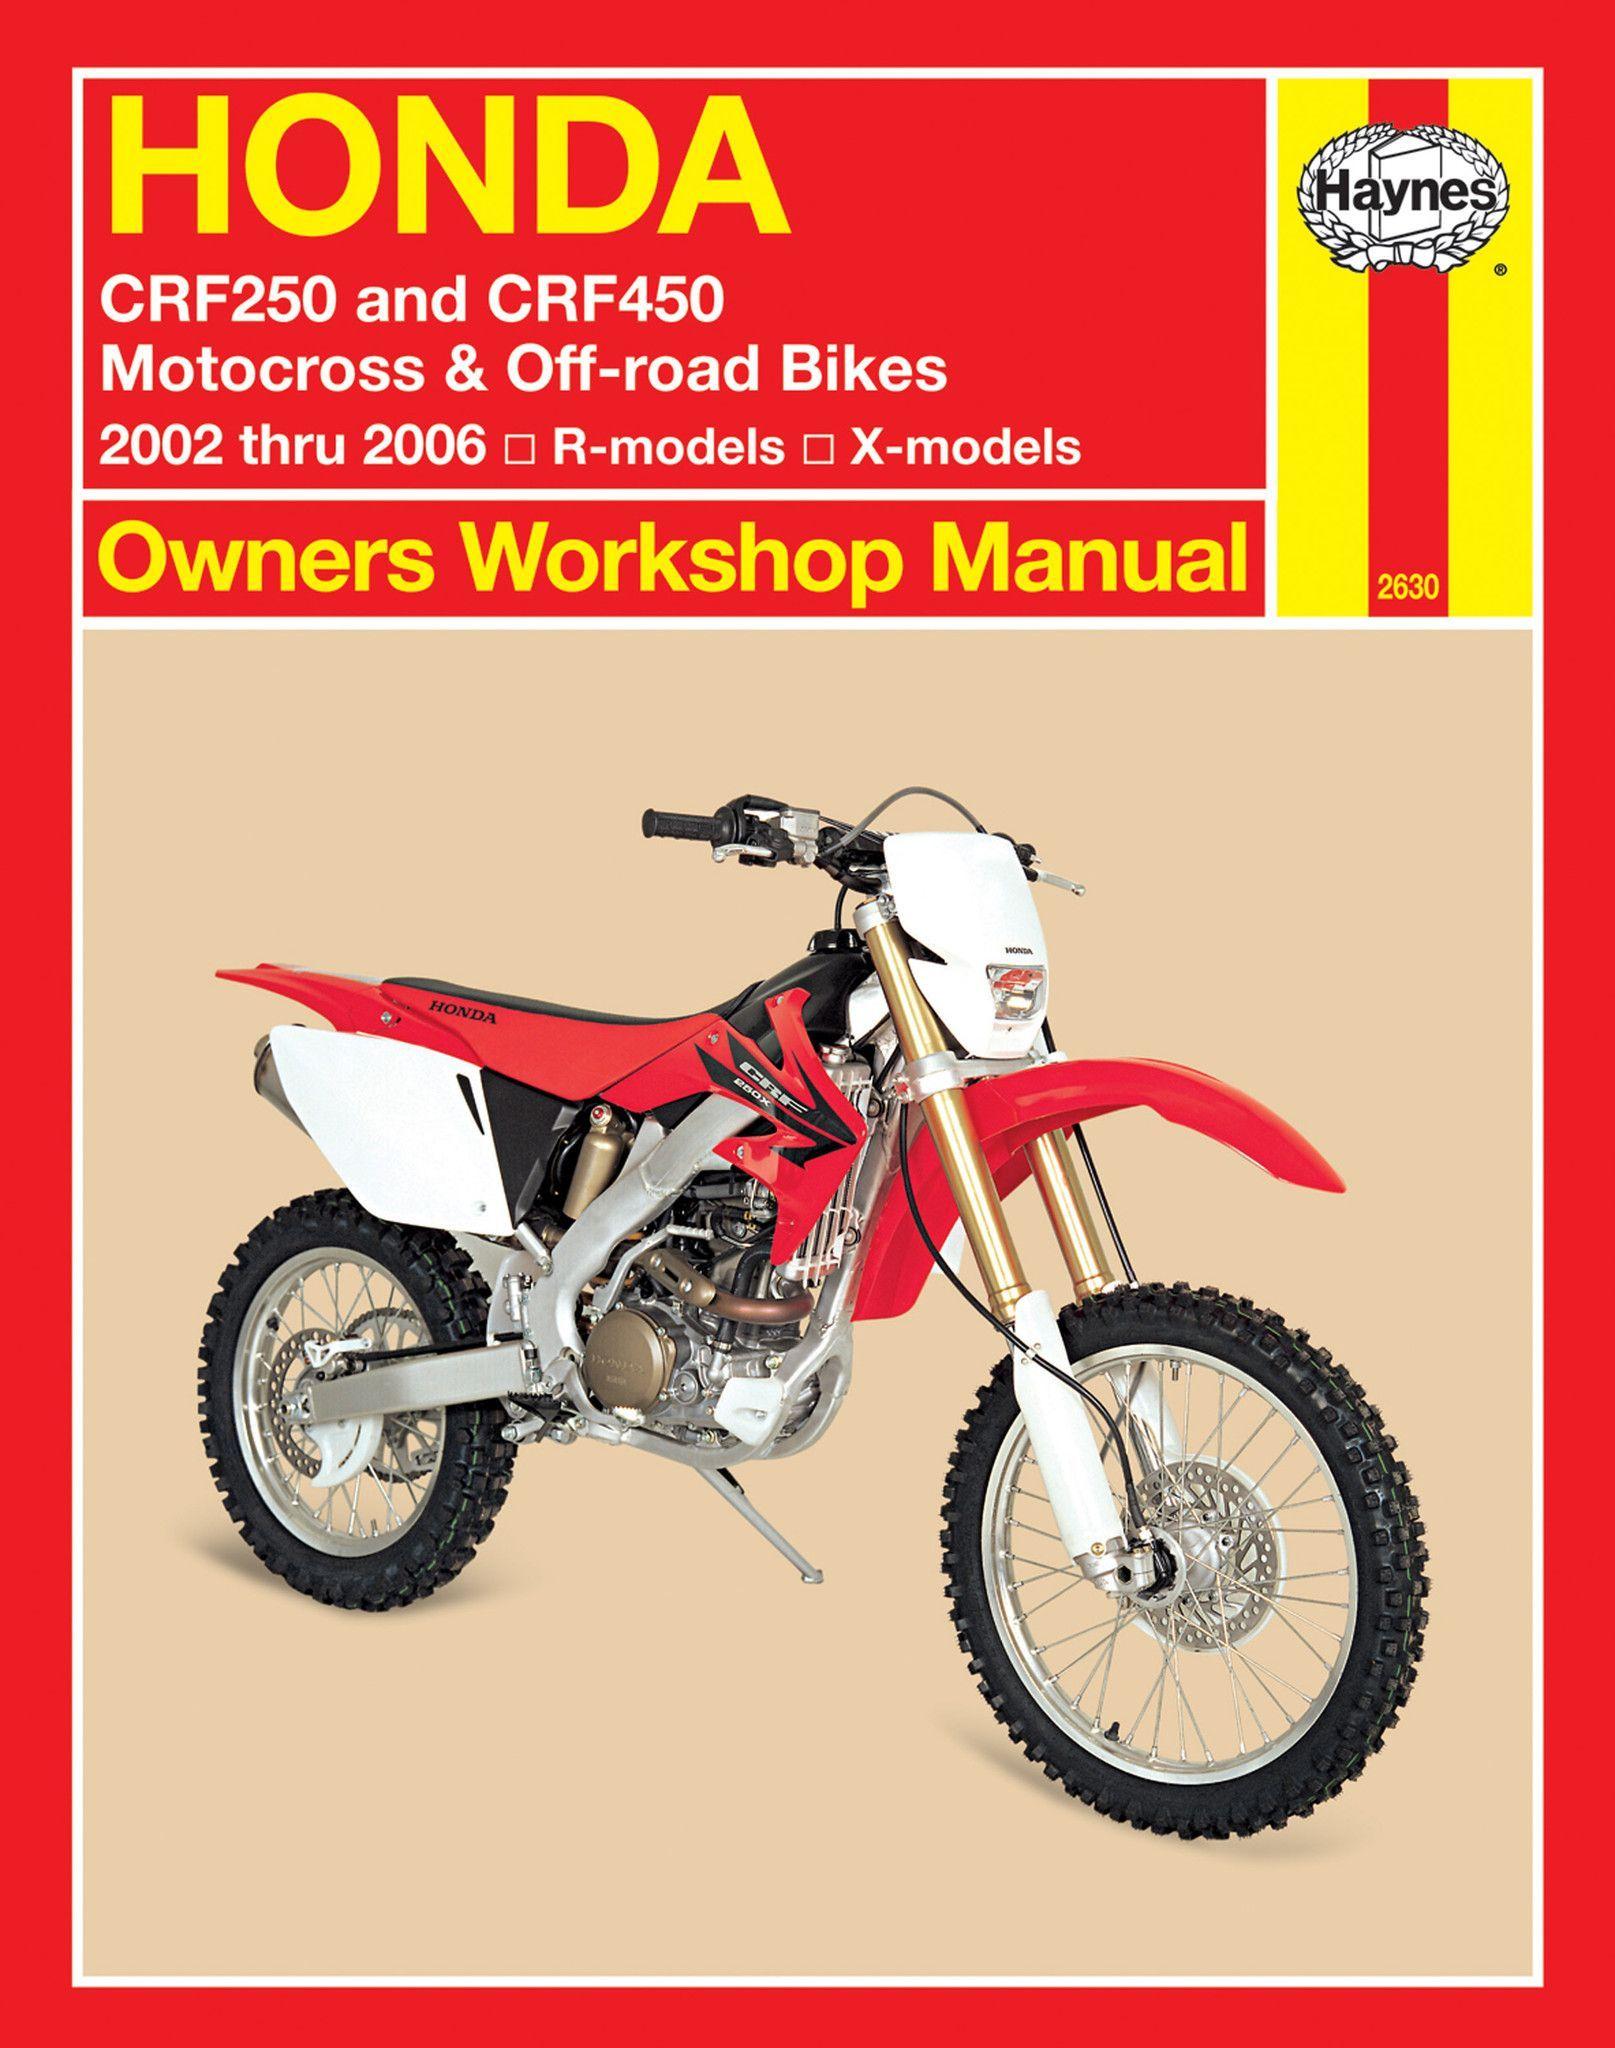 haynes m2630 repair manual for honda crf250r crf250x crf450r rh pinterest co uk honda cr125r owners manual 1999 honda cr125 owners manual